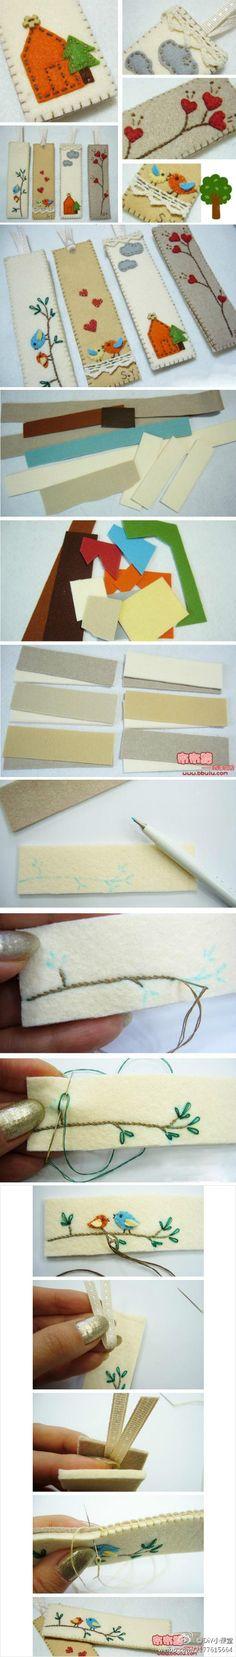 Step by step tutorial felt bookmarks